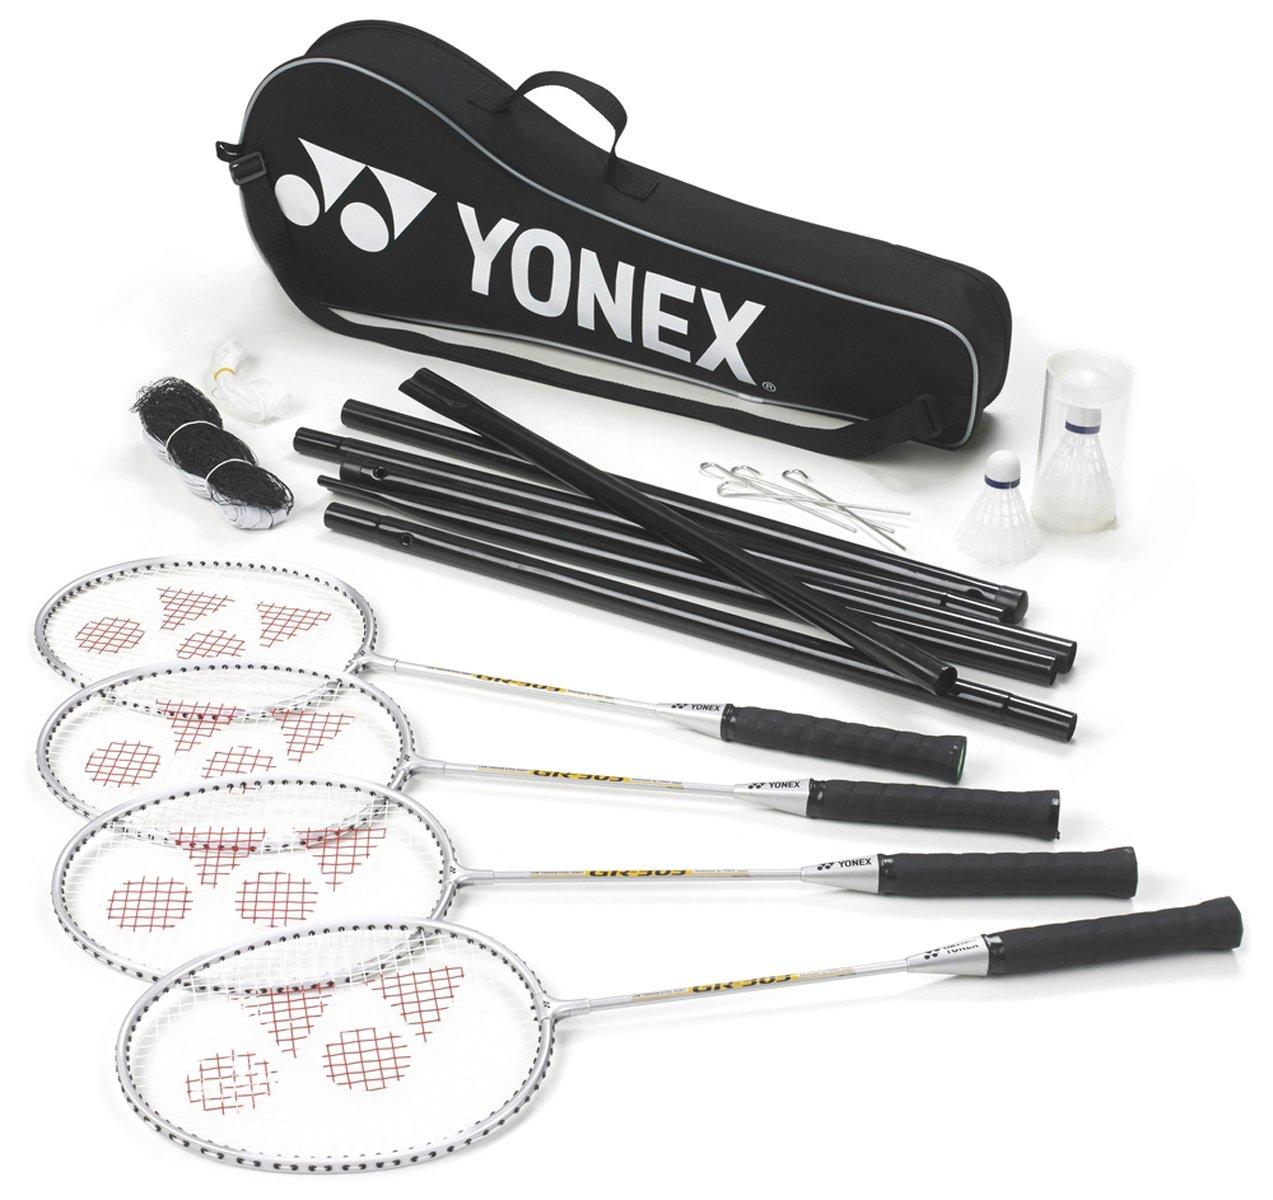 Yonex Badminton Sports 4 Player Set (racket, shuttles, net, post, & Carry Bag) Only